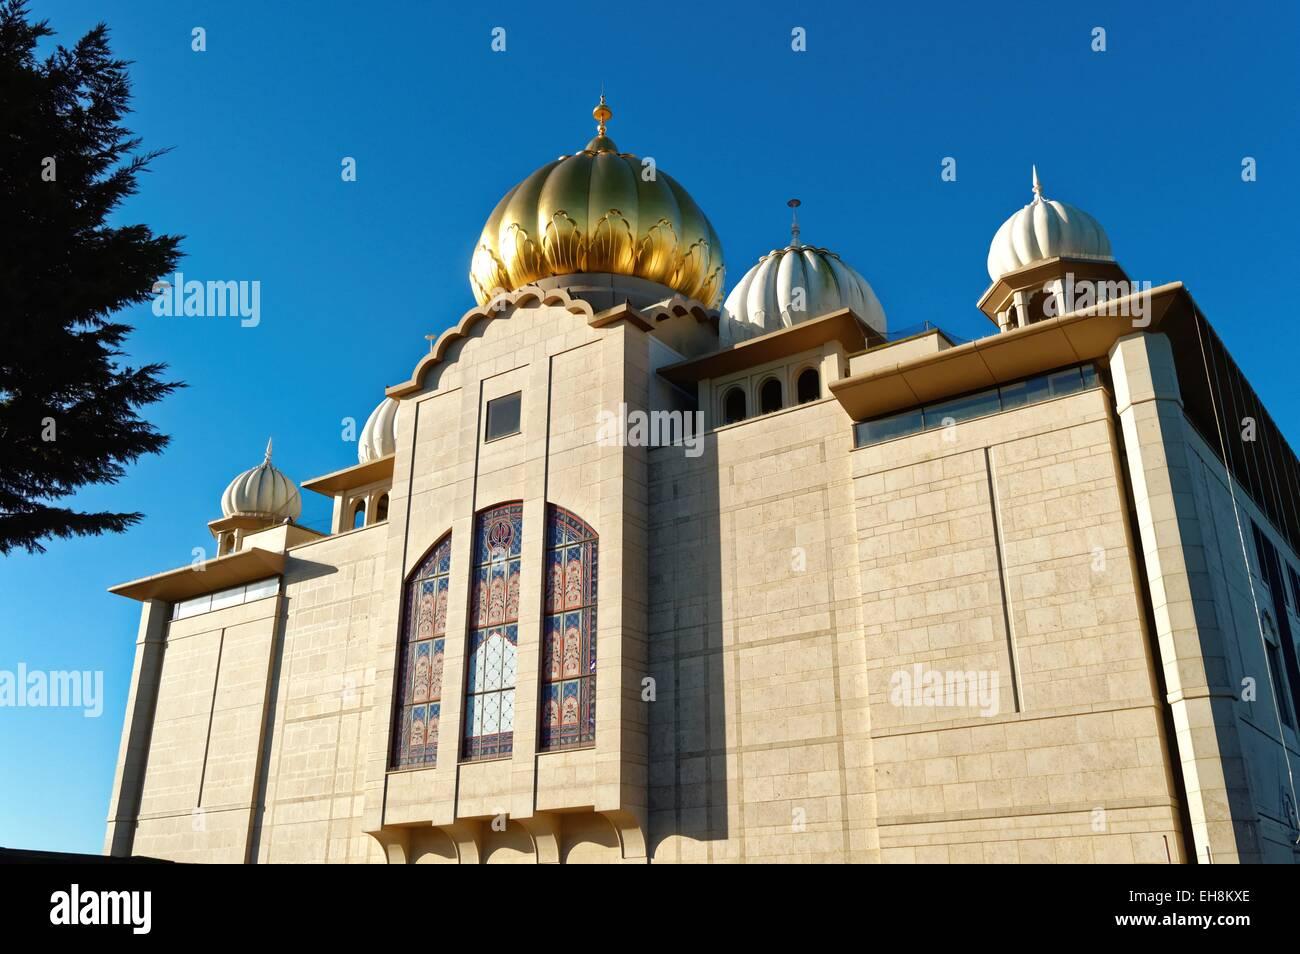 Gurdwara Sri Guru Singh Sabha Temple Southall West London - Stock Image